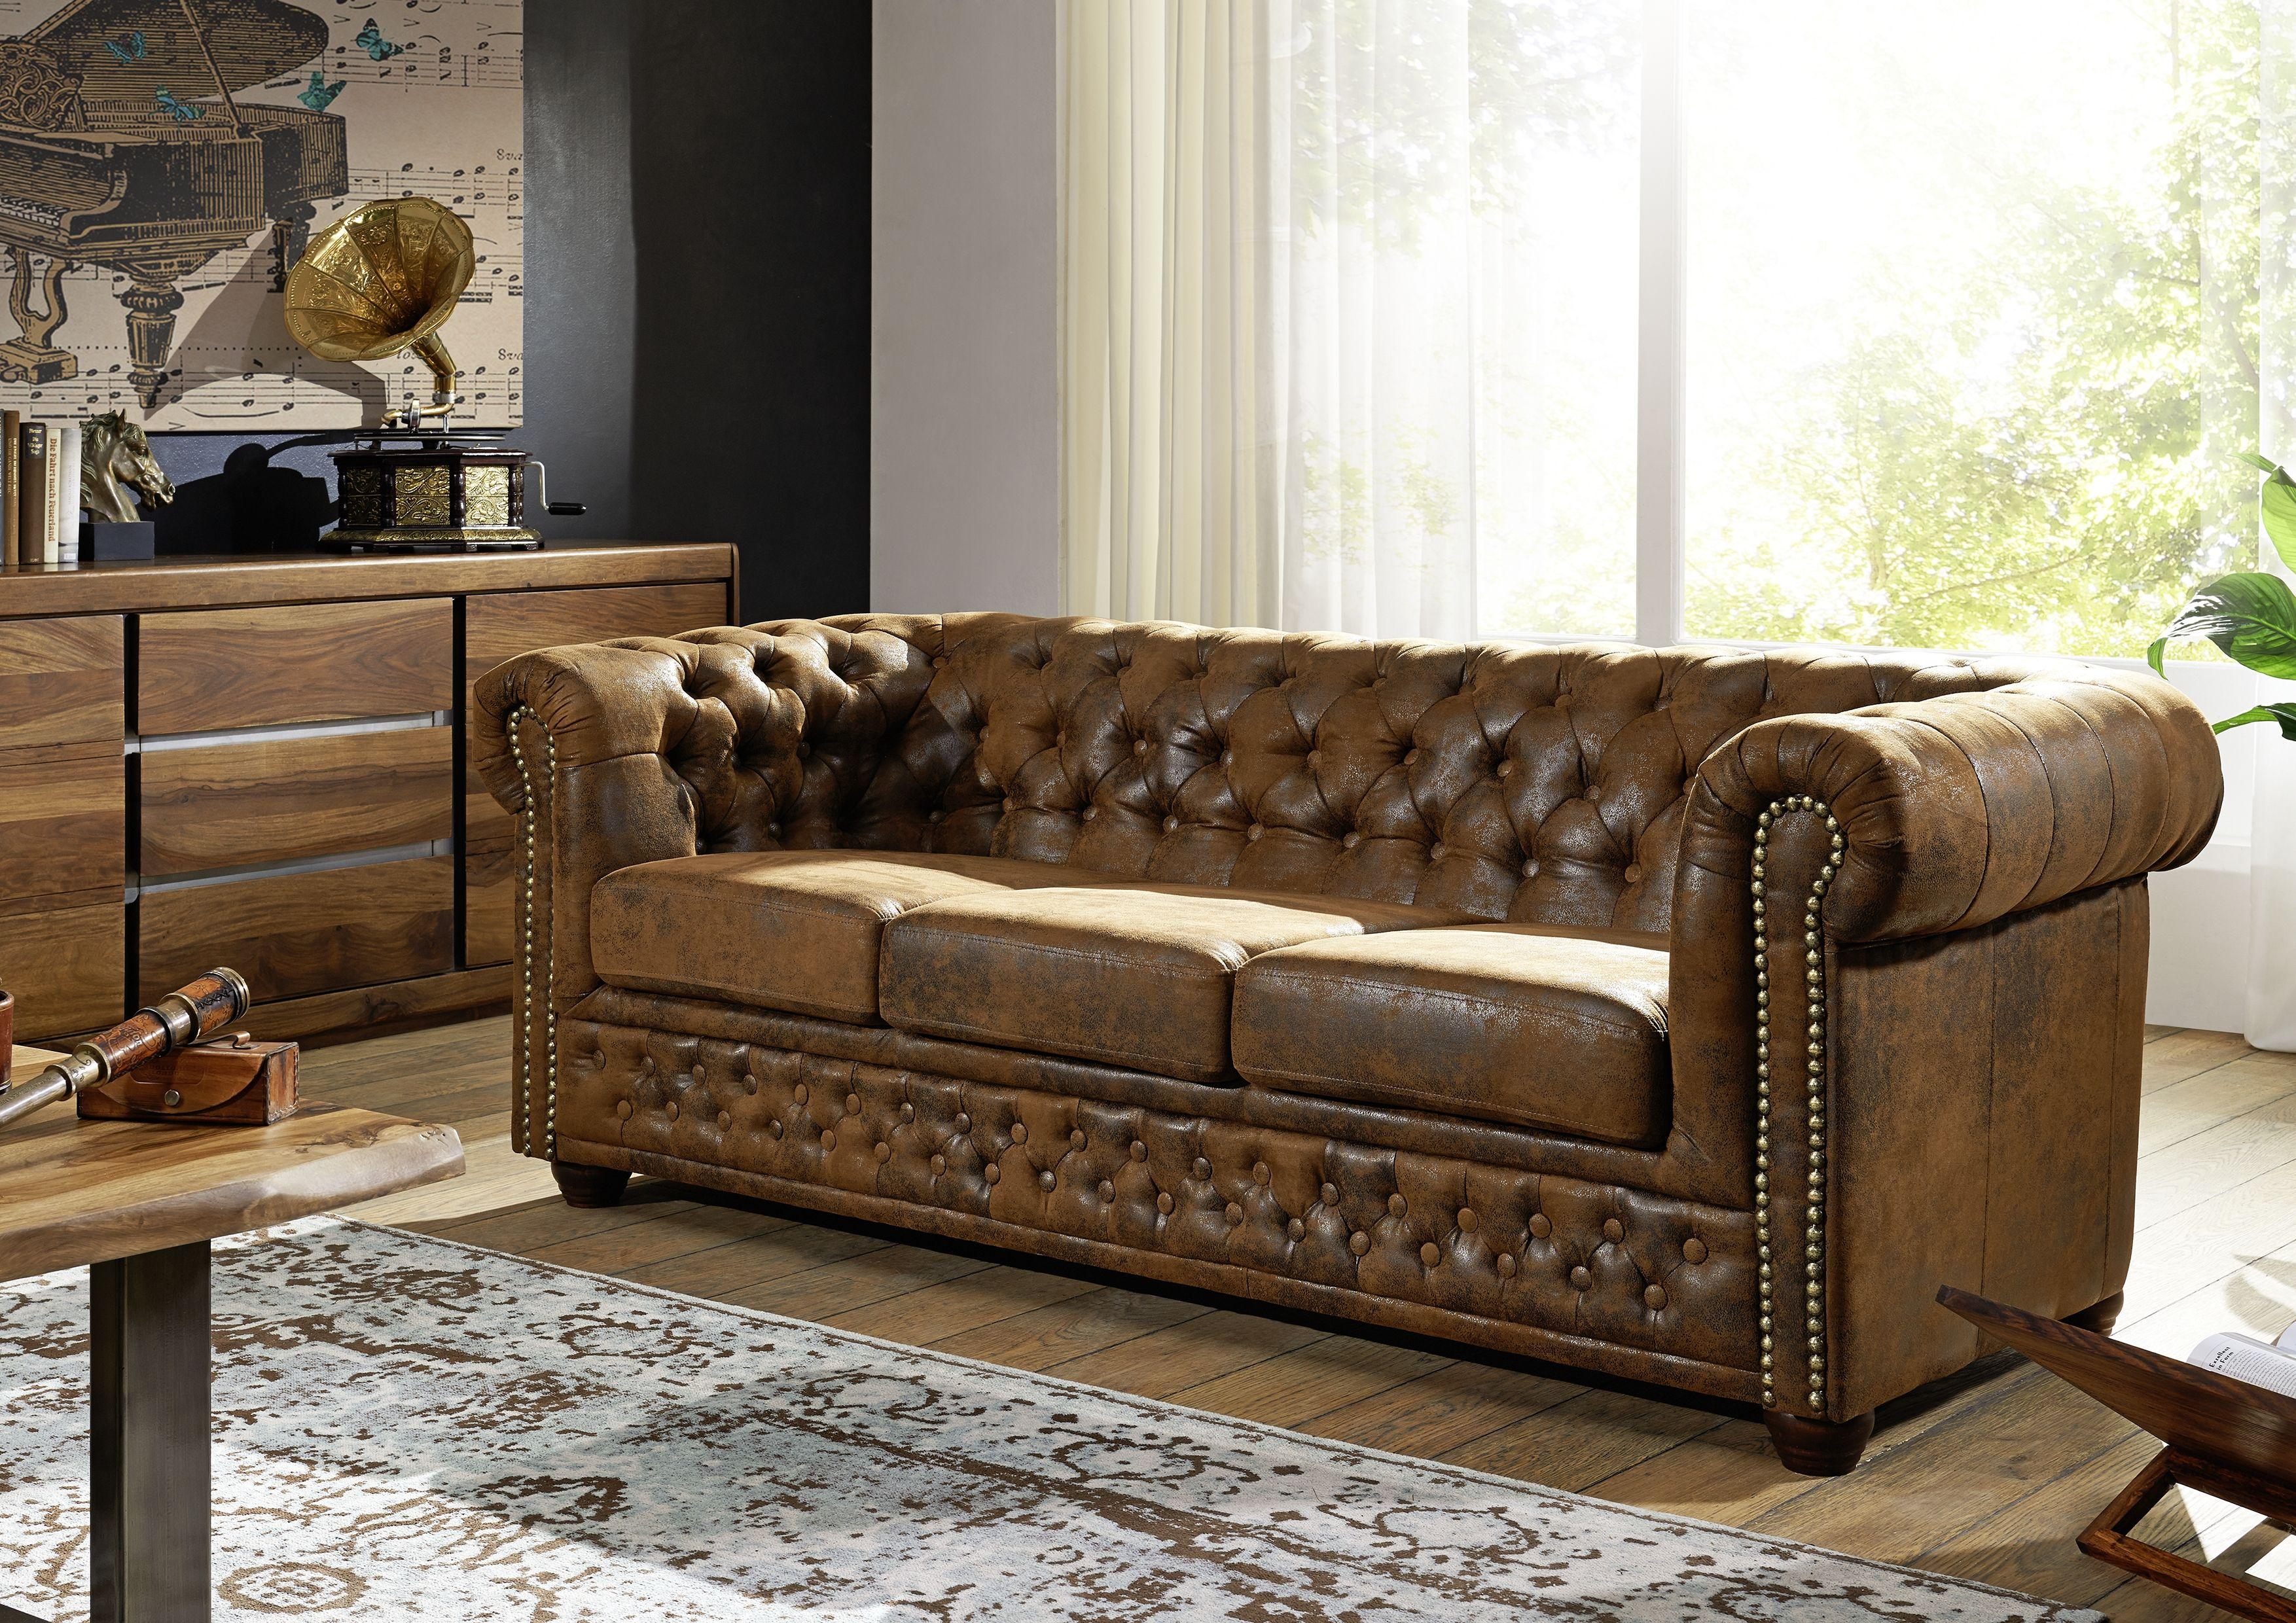 Polstermöbel, Sofas, Wohnlandschaften, Sessel & Co. | Möbel ...